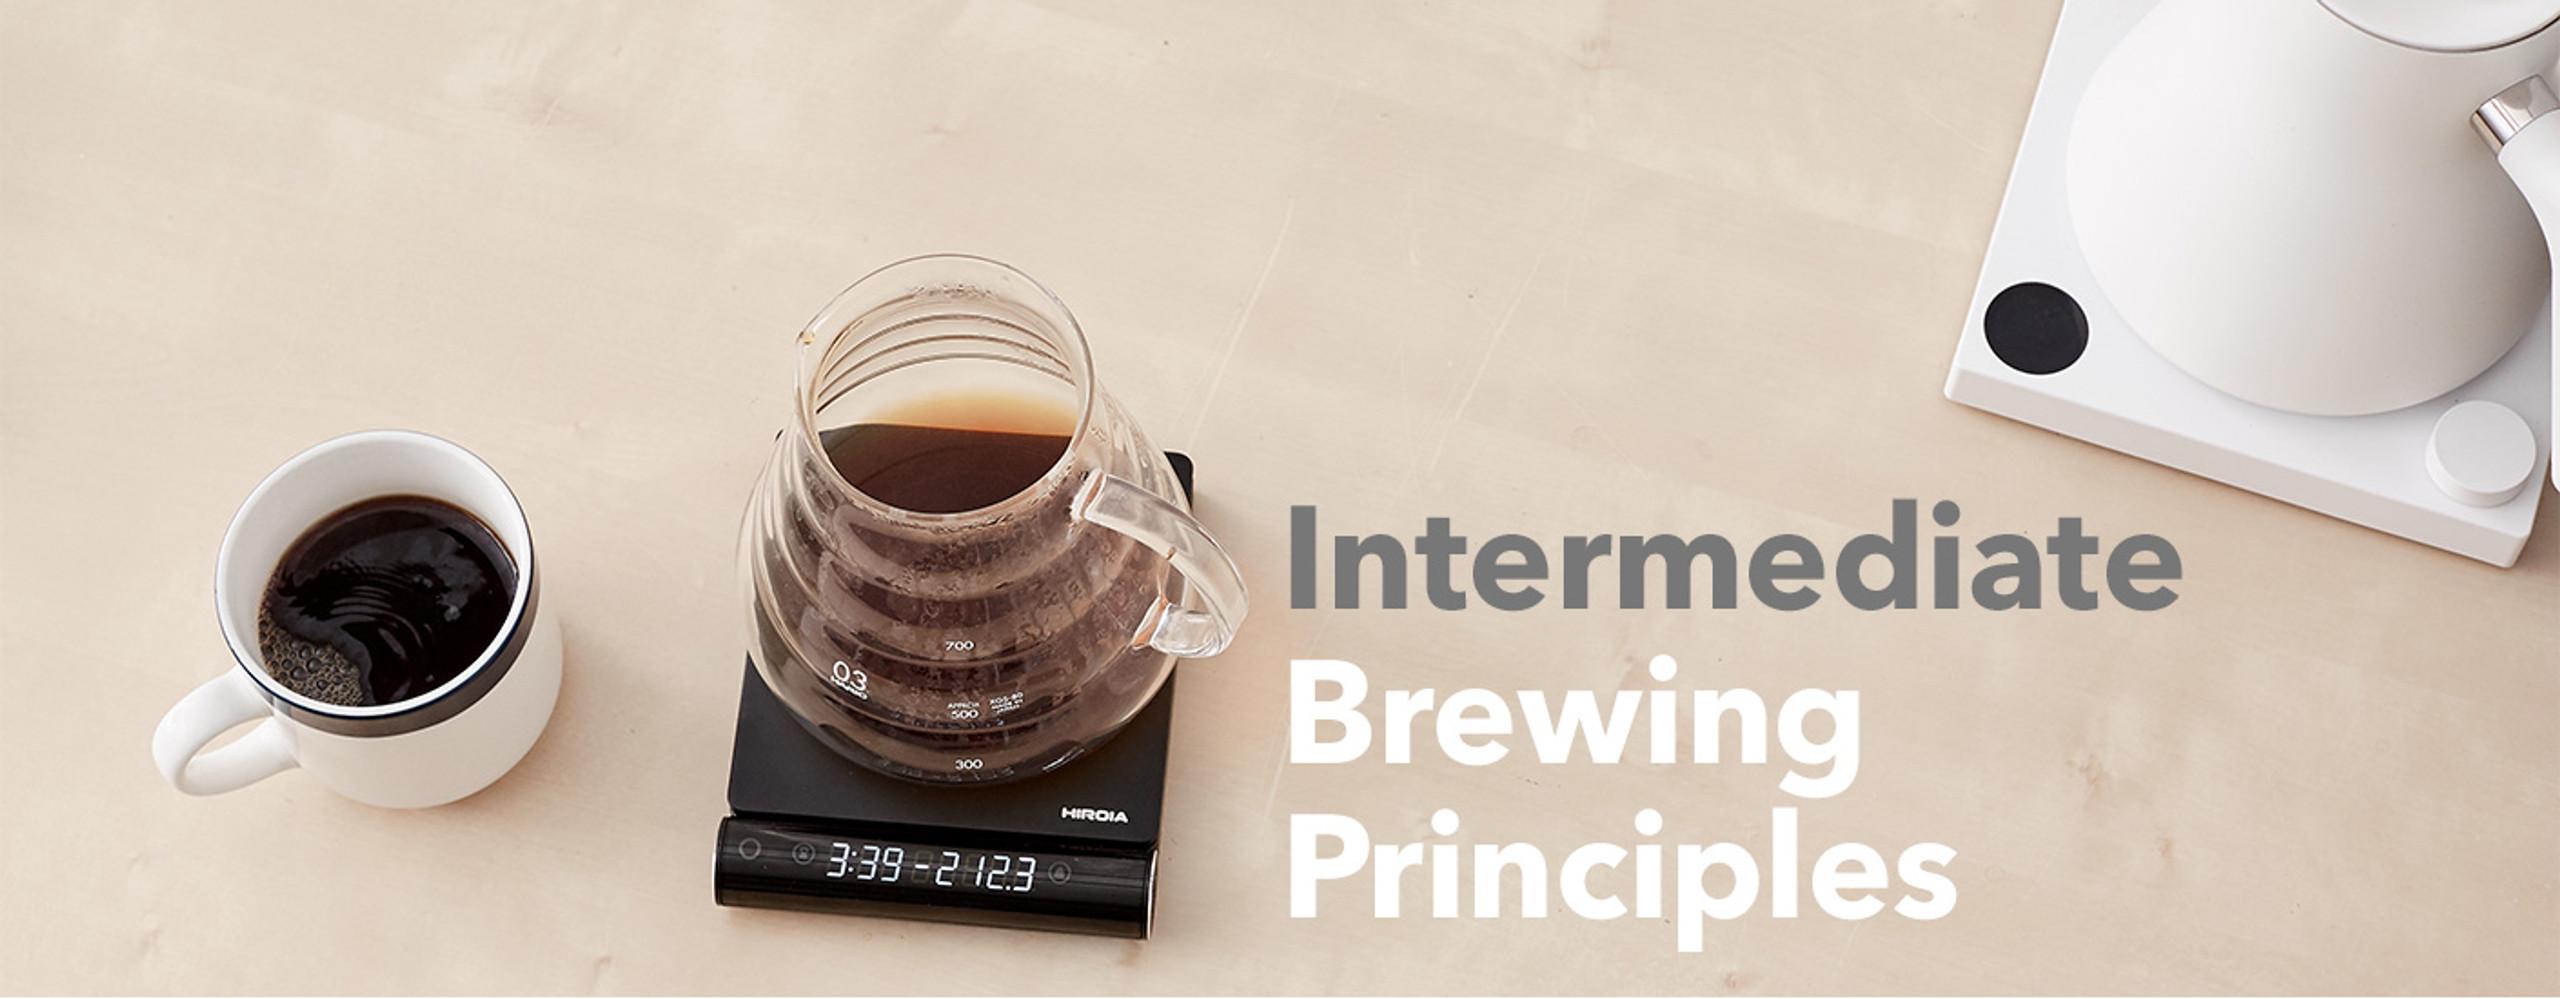 Intermediate Brewing Principles